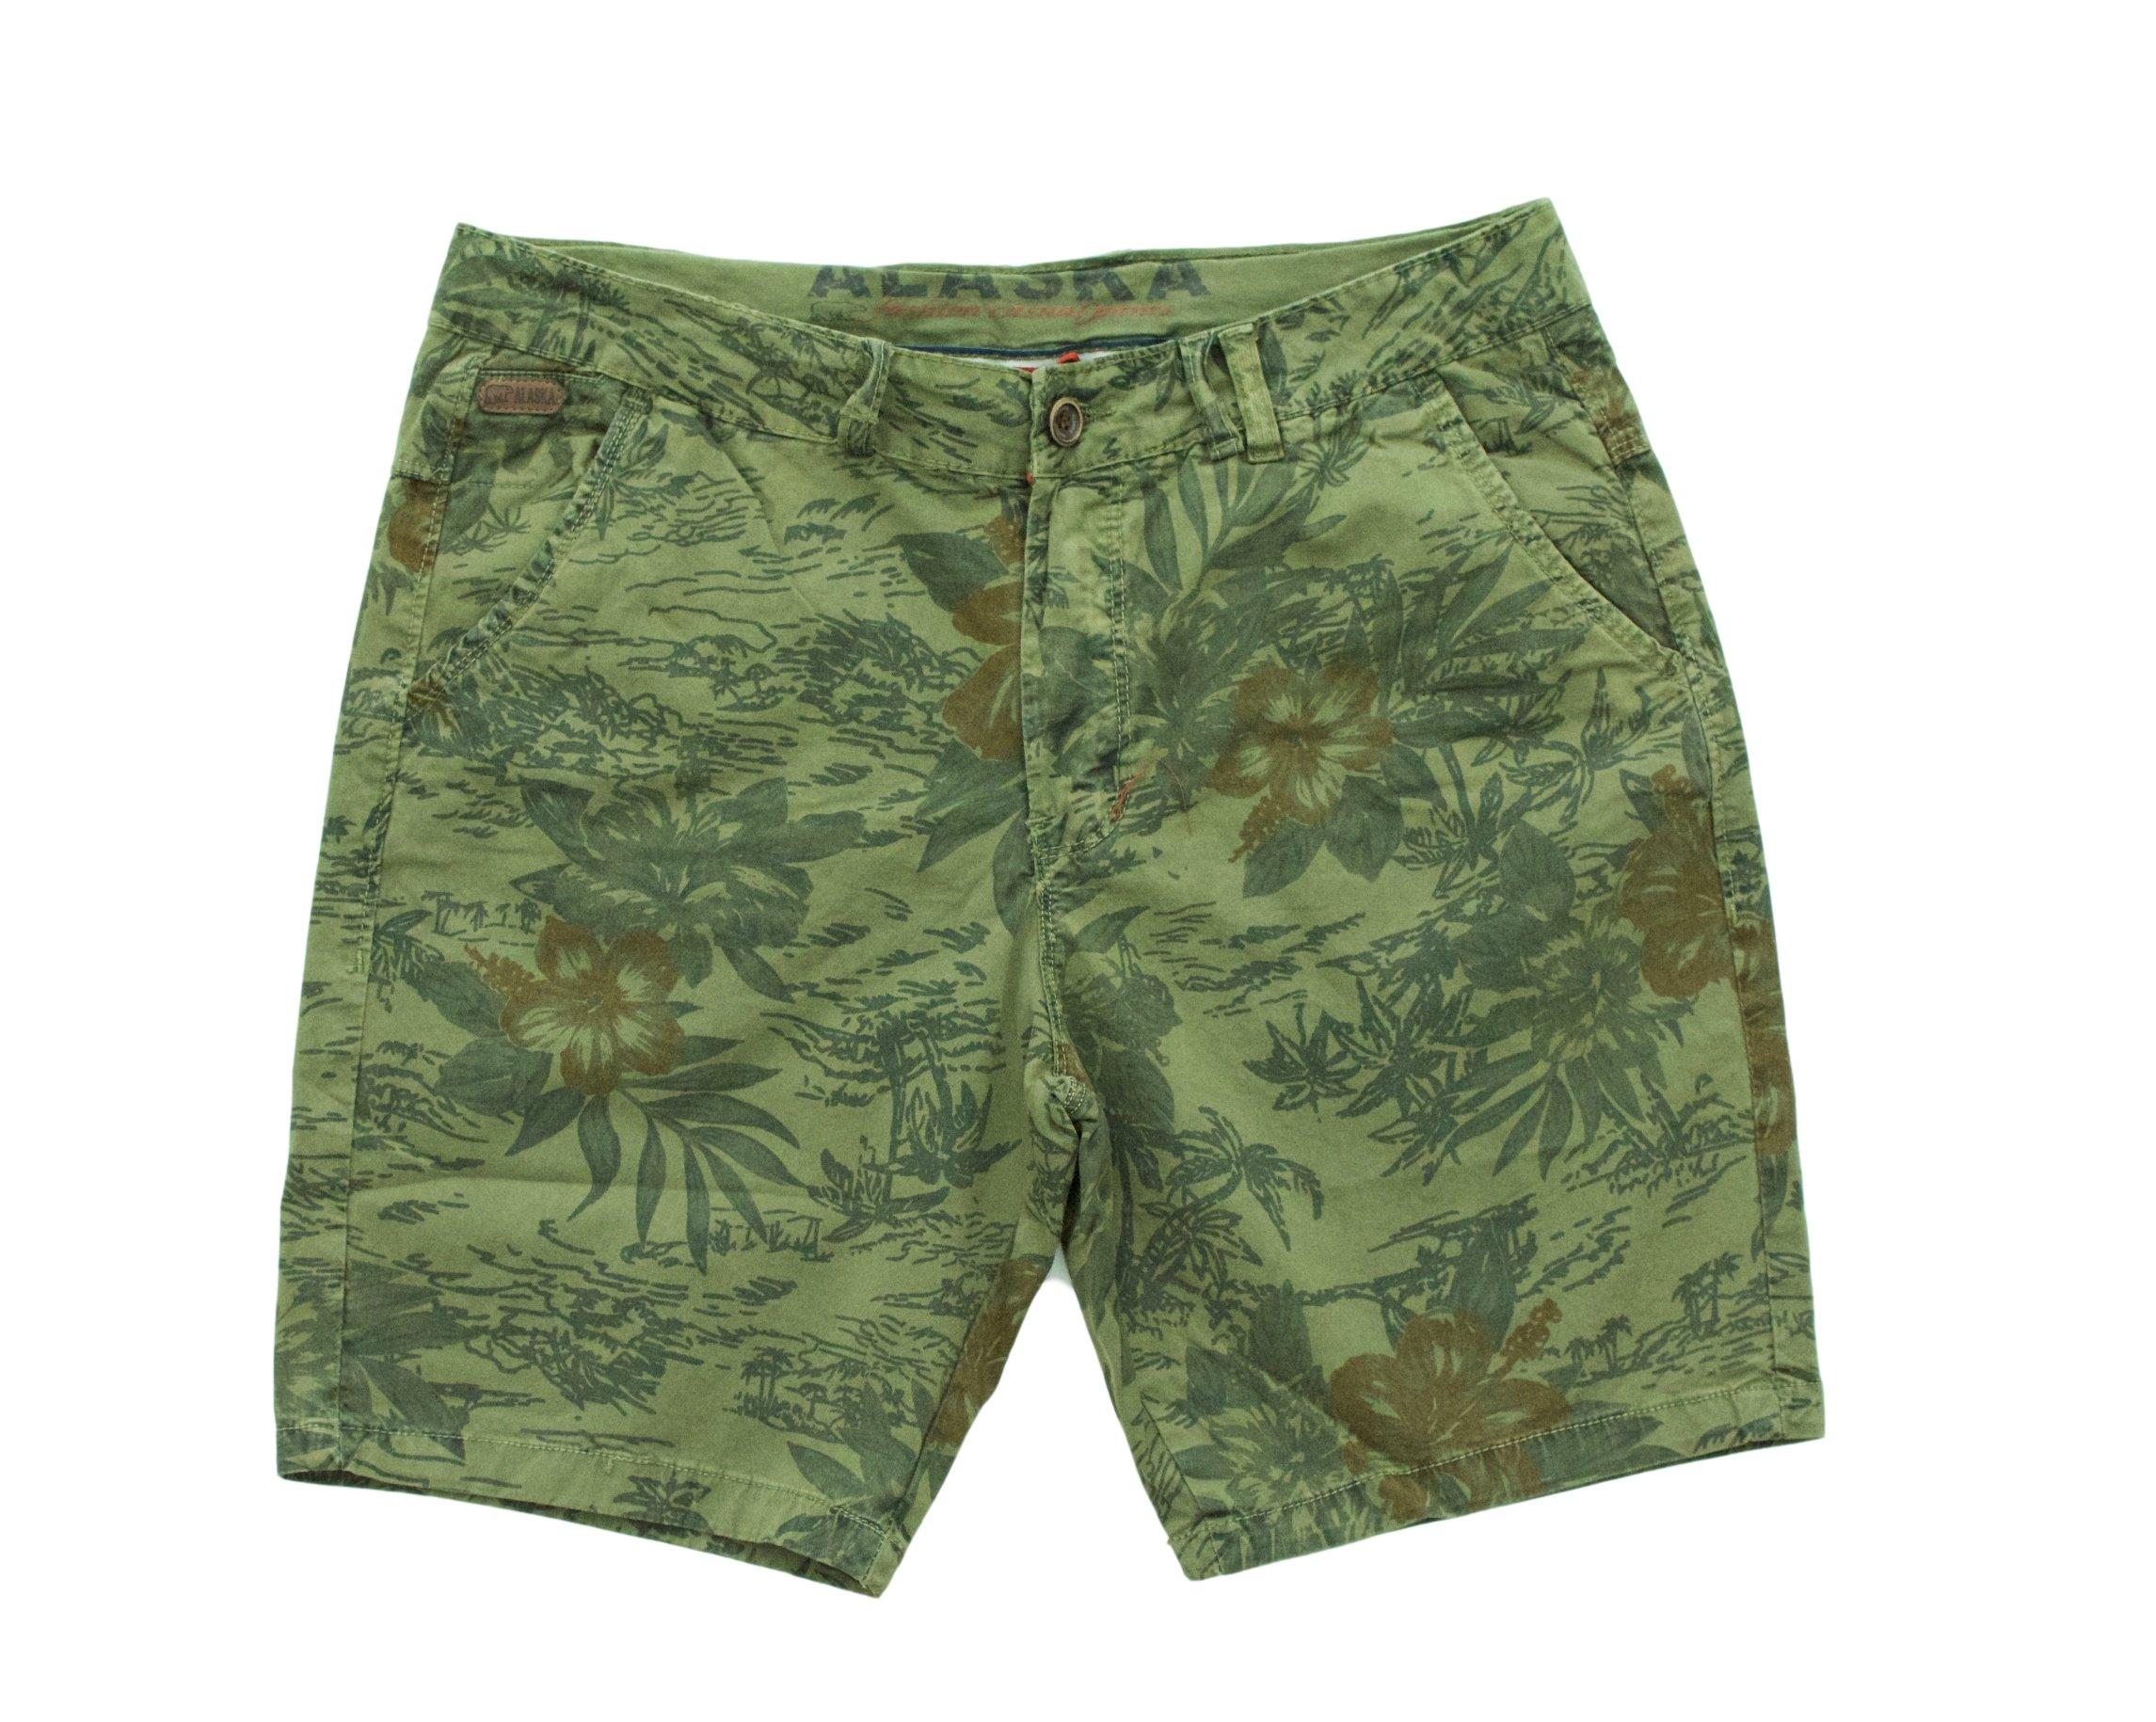 Alaska Mens Hawaiian print walking shorts with stretch (831 Army, 36)